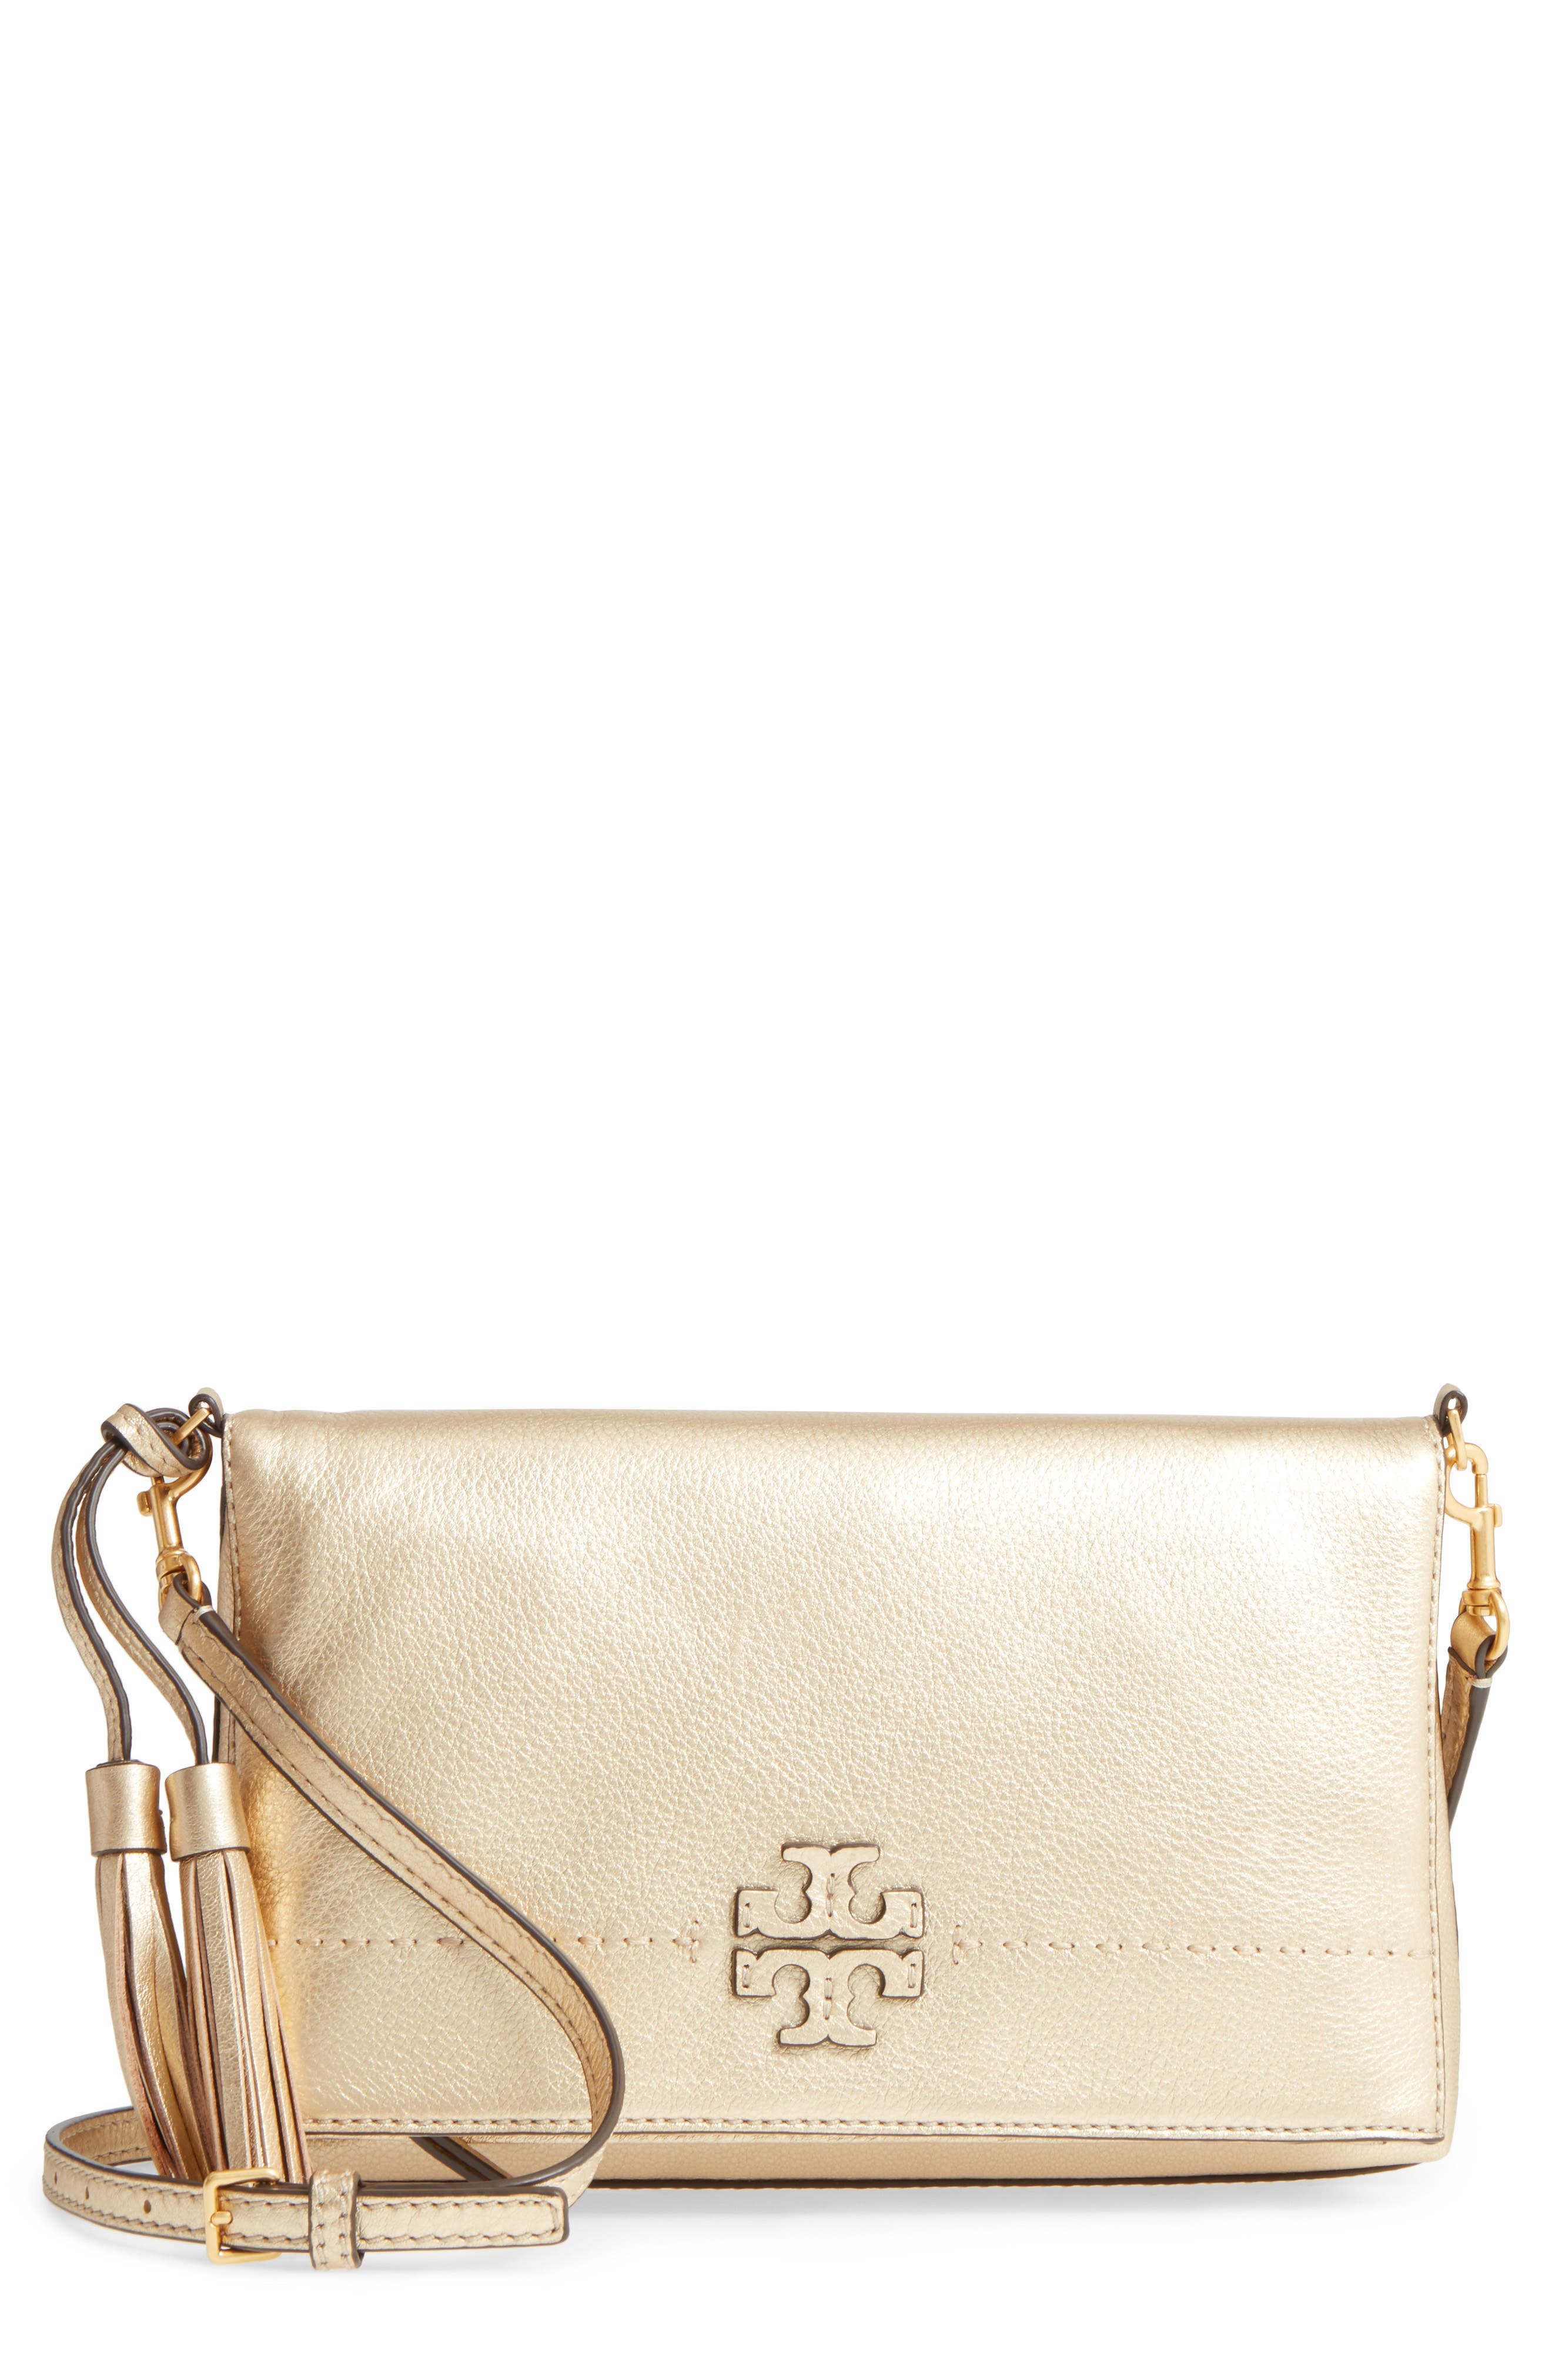 Tory Burch McGraw Metallic Leather Crossbody Bag